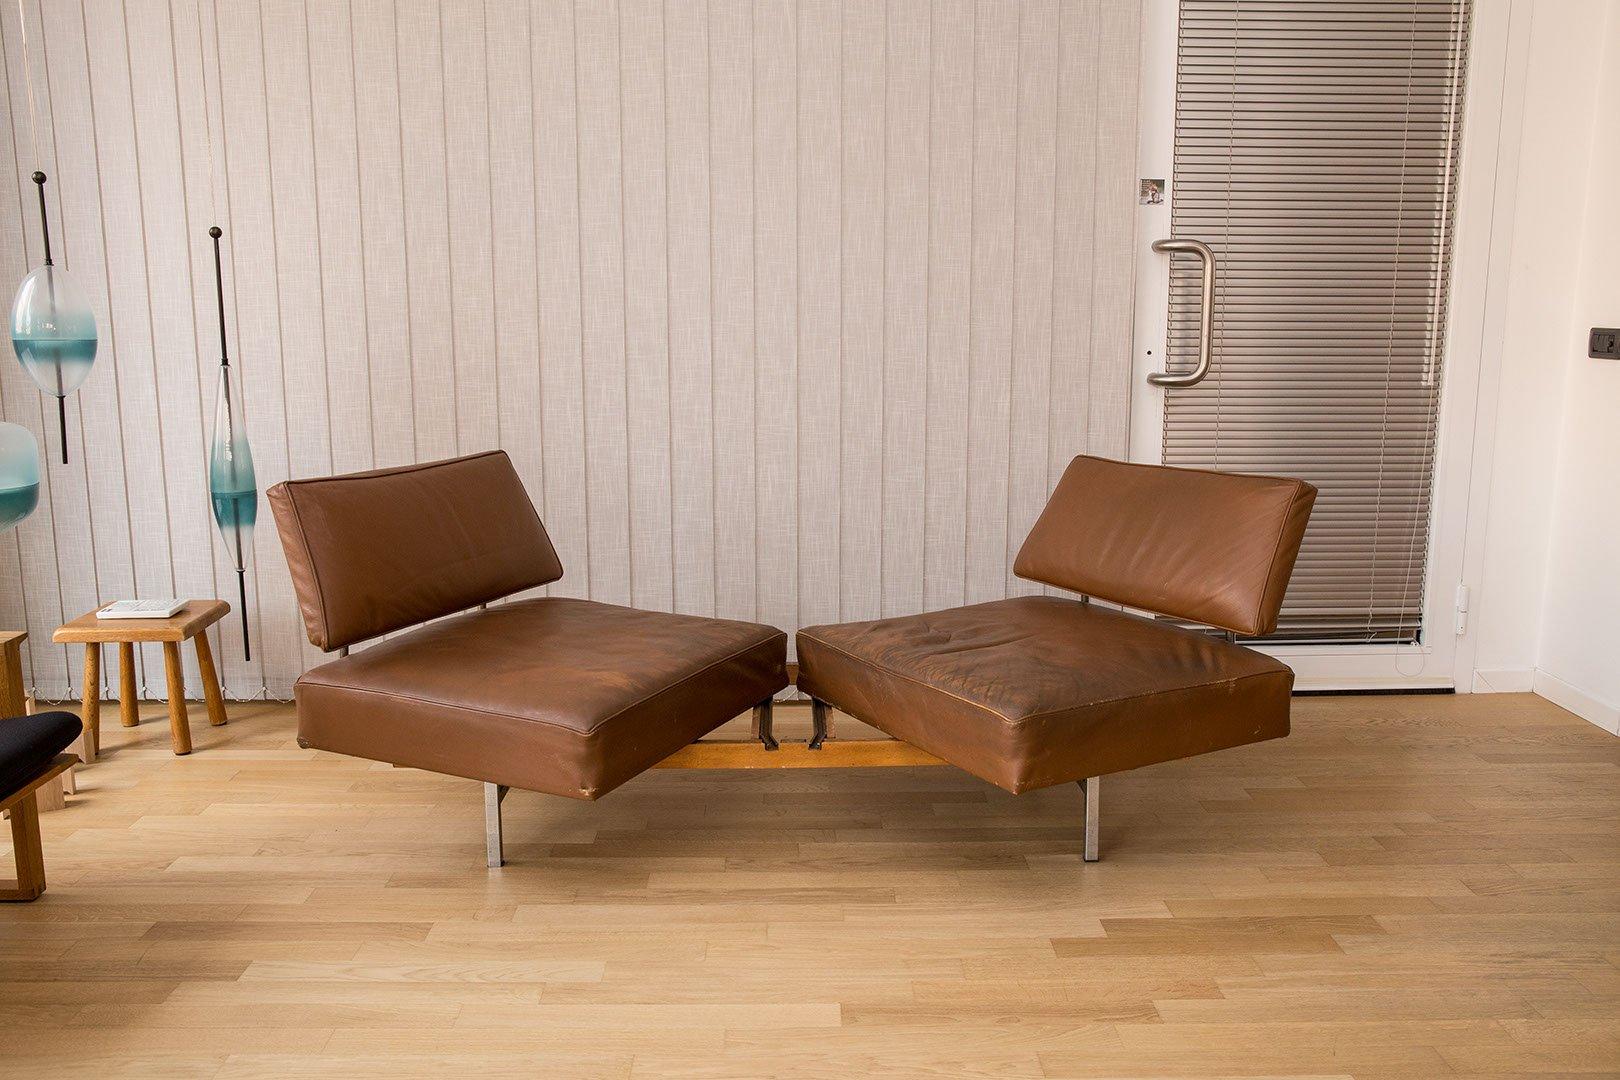 vintage 2 sitzer sofa aus cognacfarbenem leder von walter knoll f r knoll bei pamono kaufen. Black Bedroom Furniture Sets. Home Design Ideas